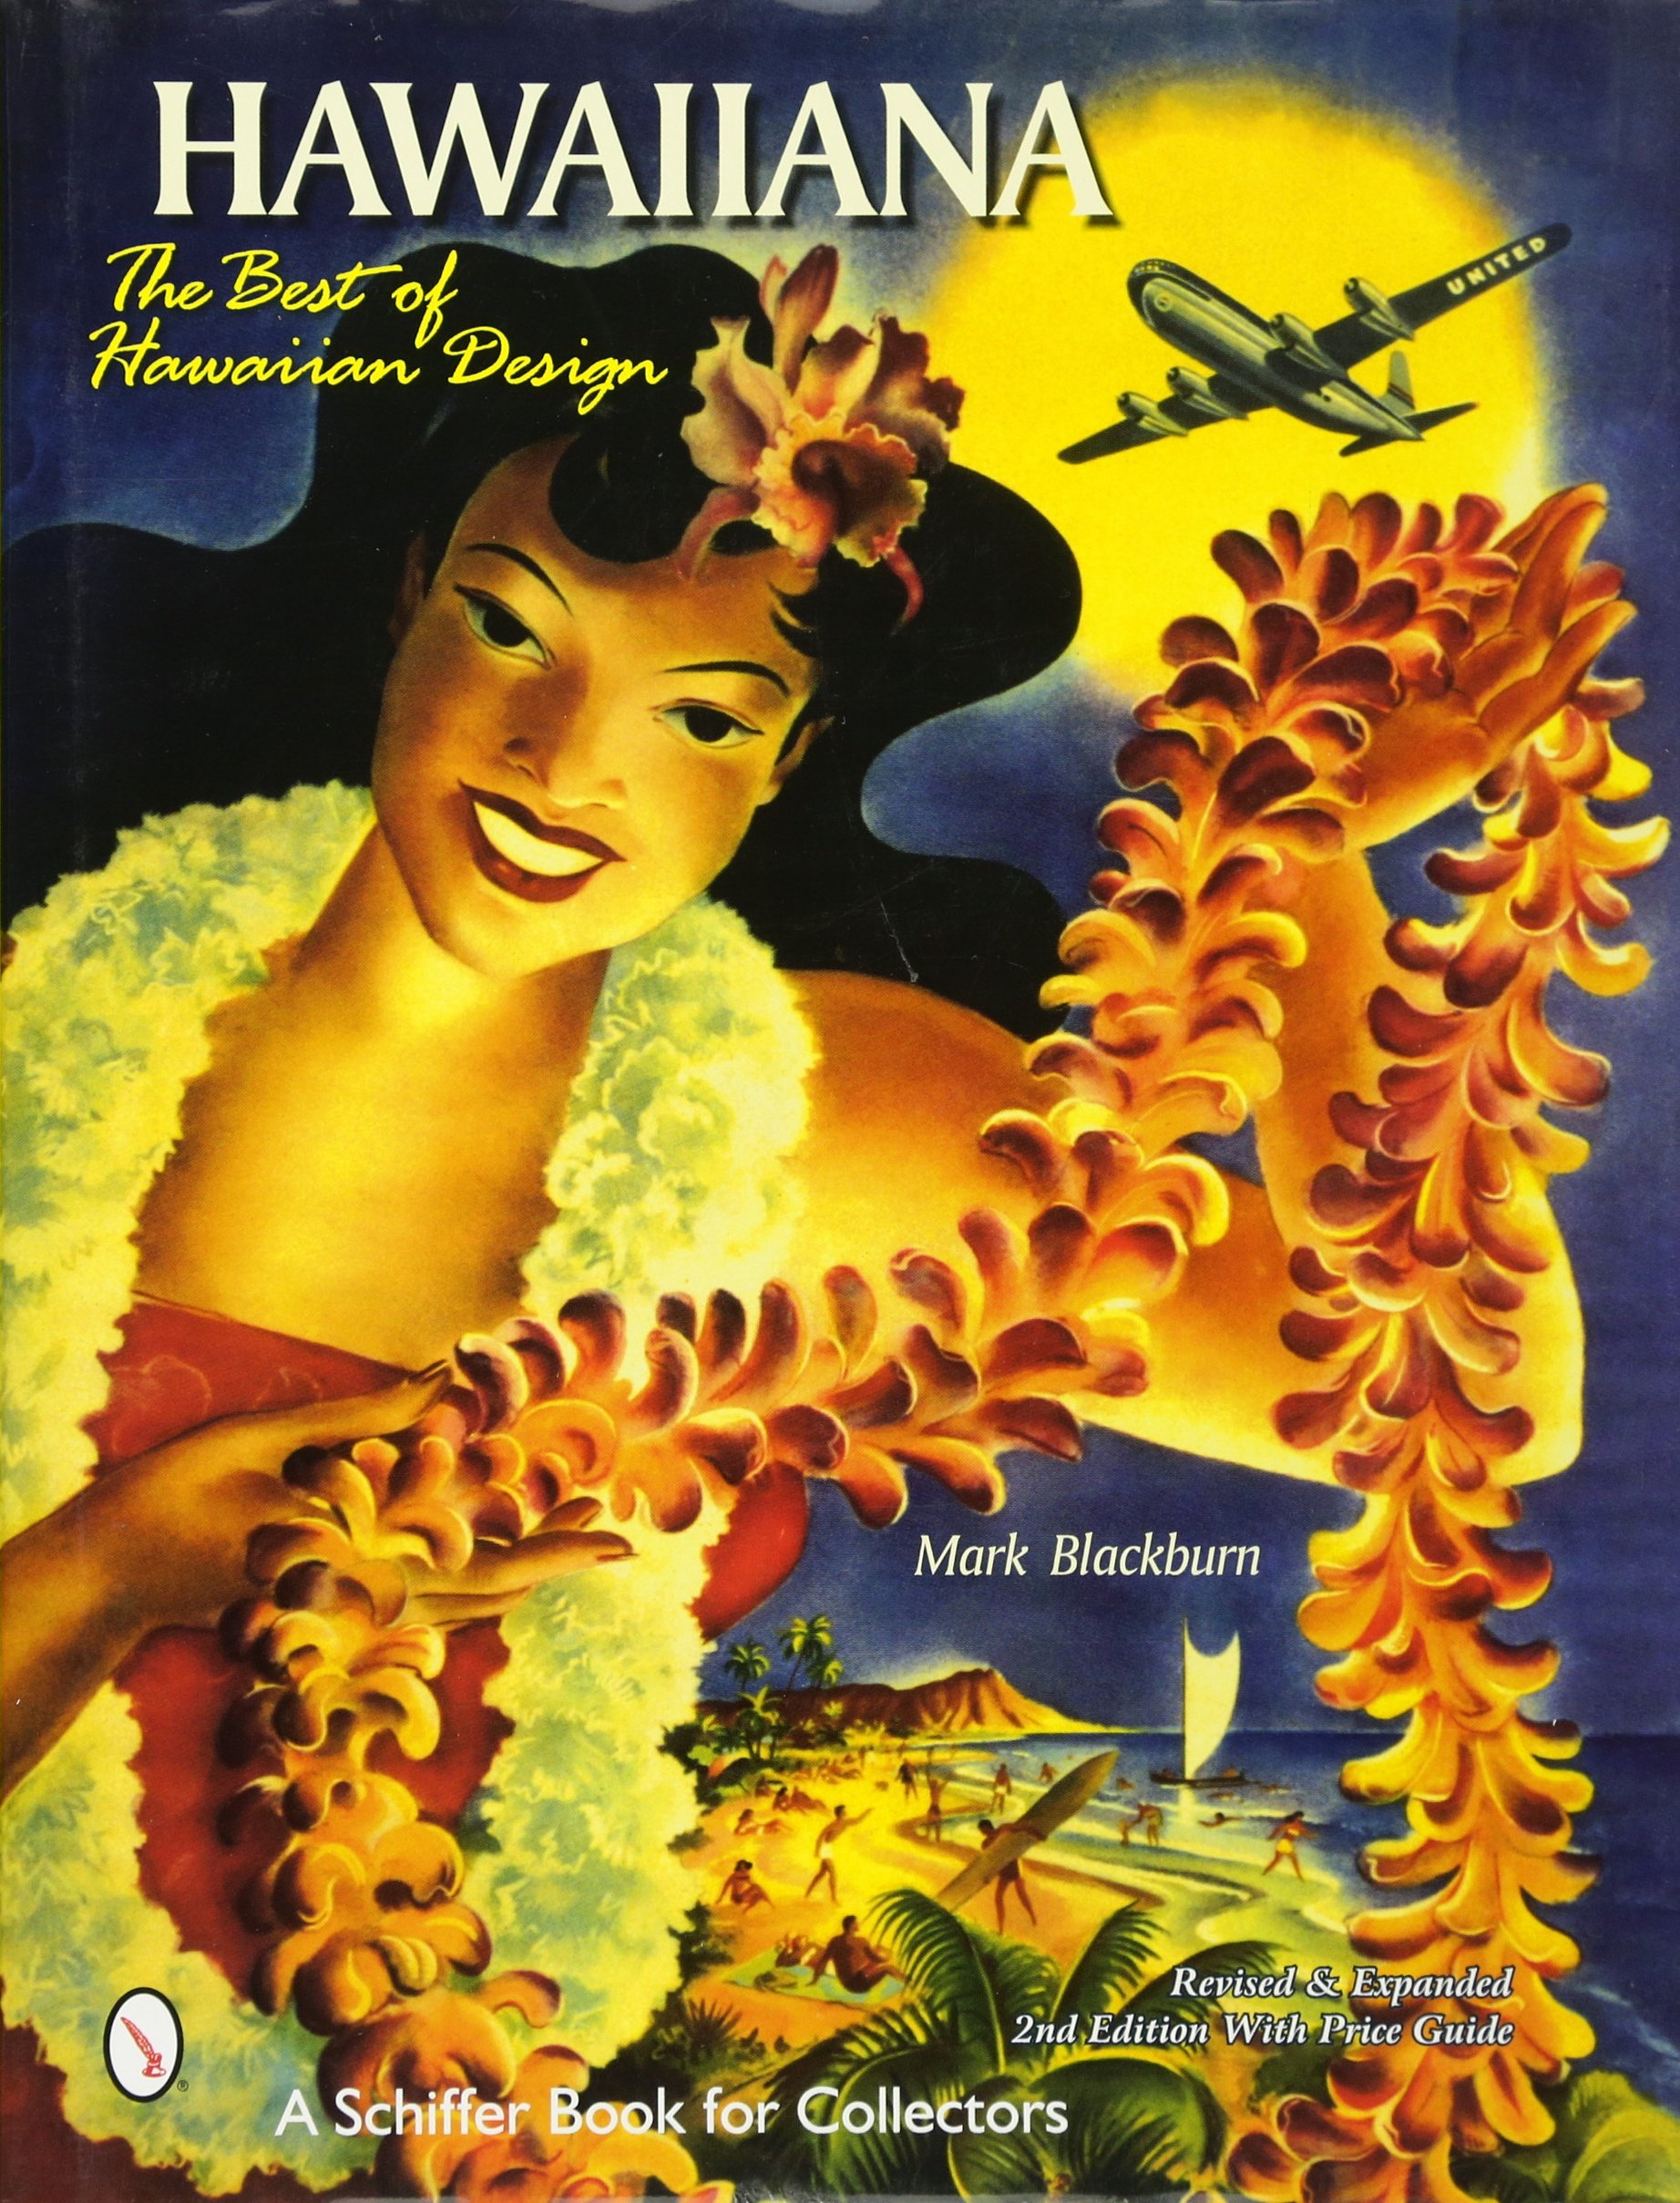 Hawaiiana: The Best of Hawaiian Design (A Schiffer Book for Collectors)